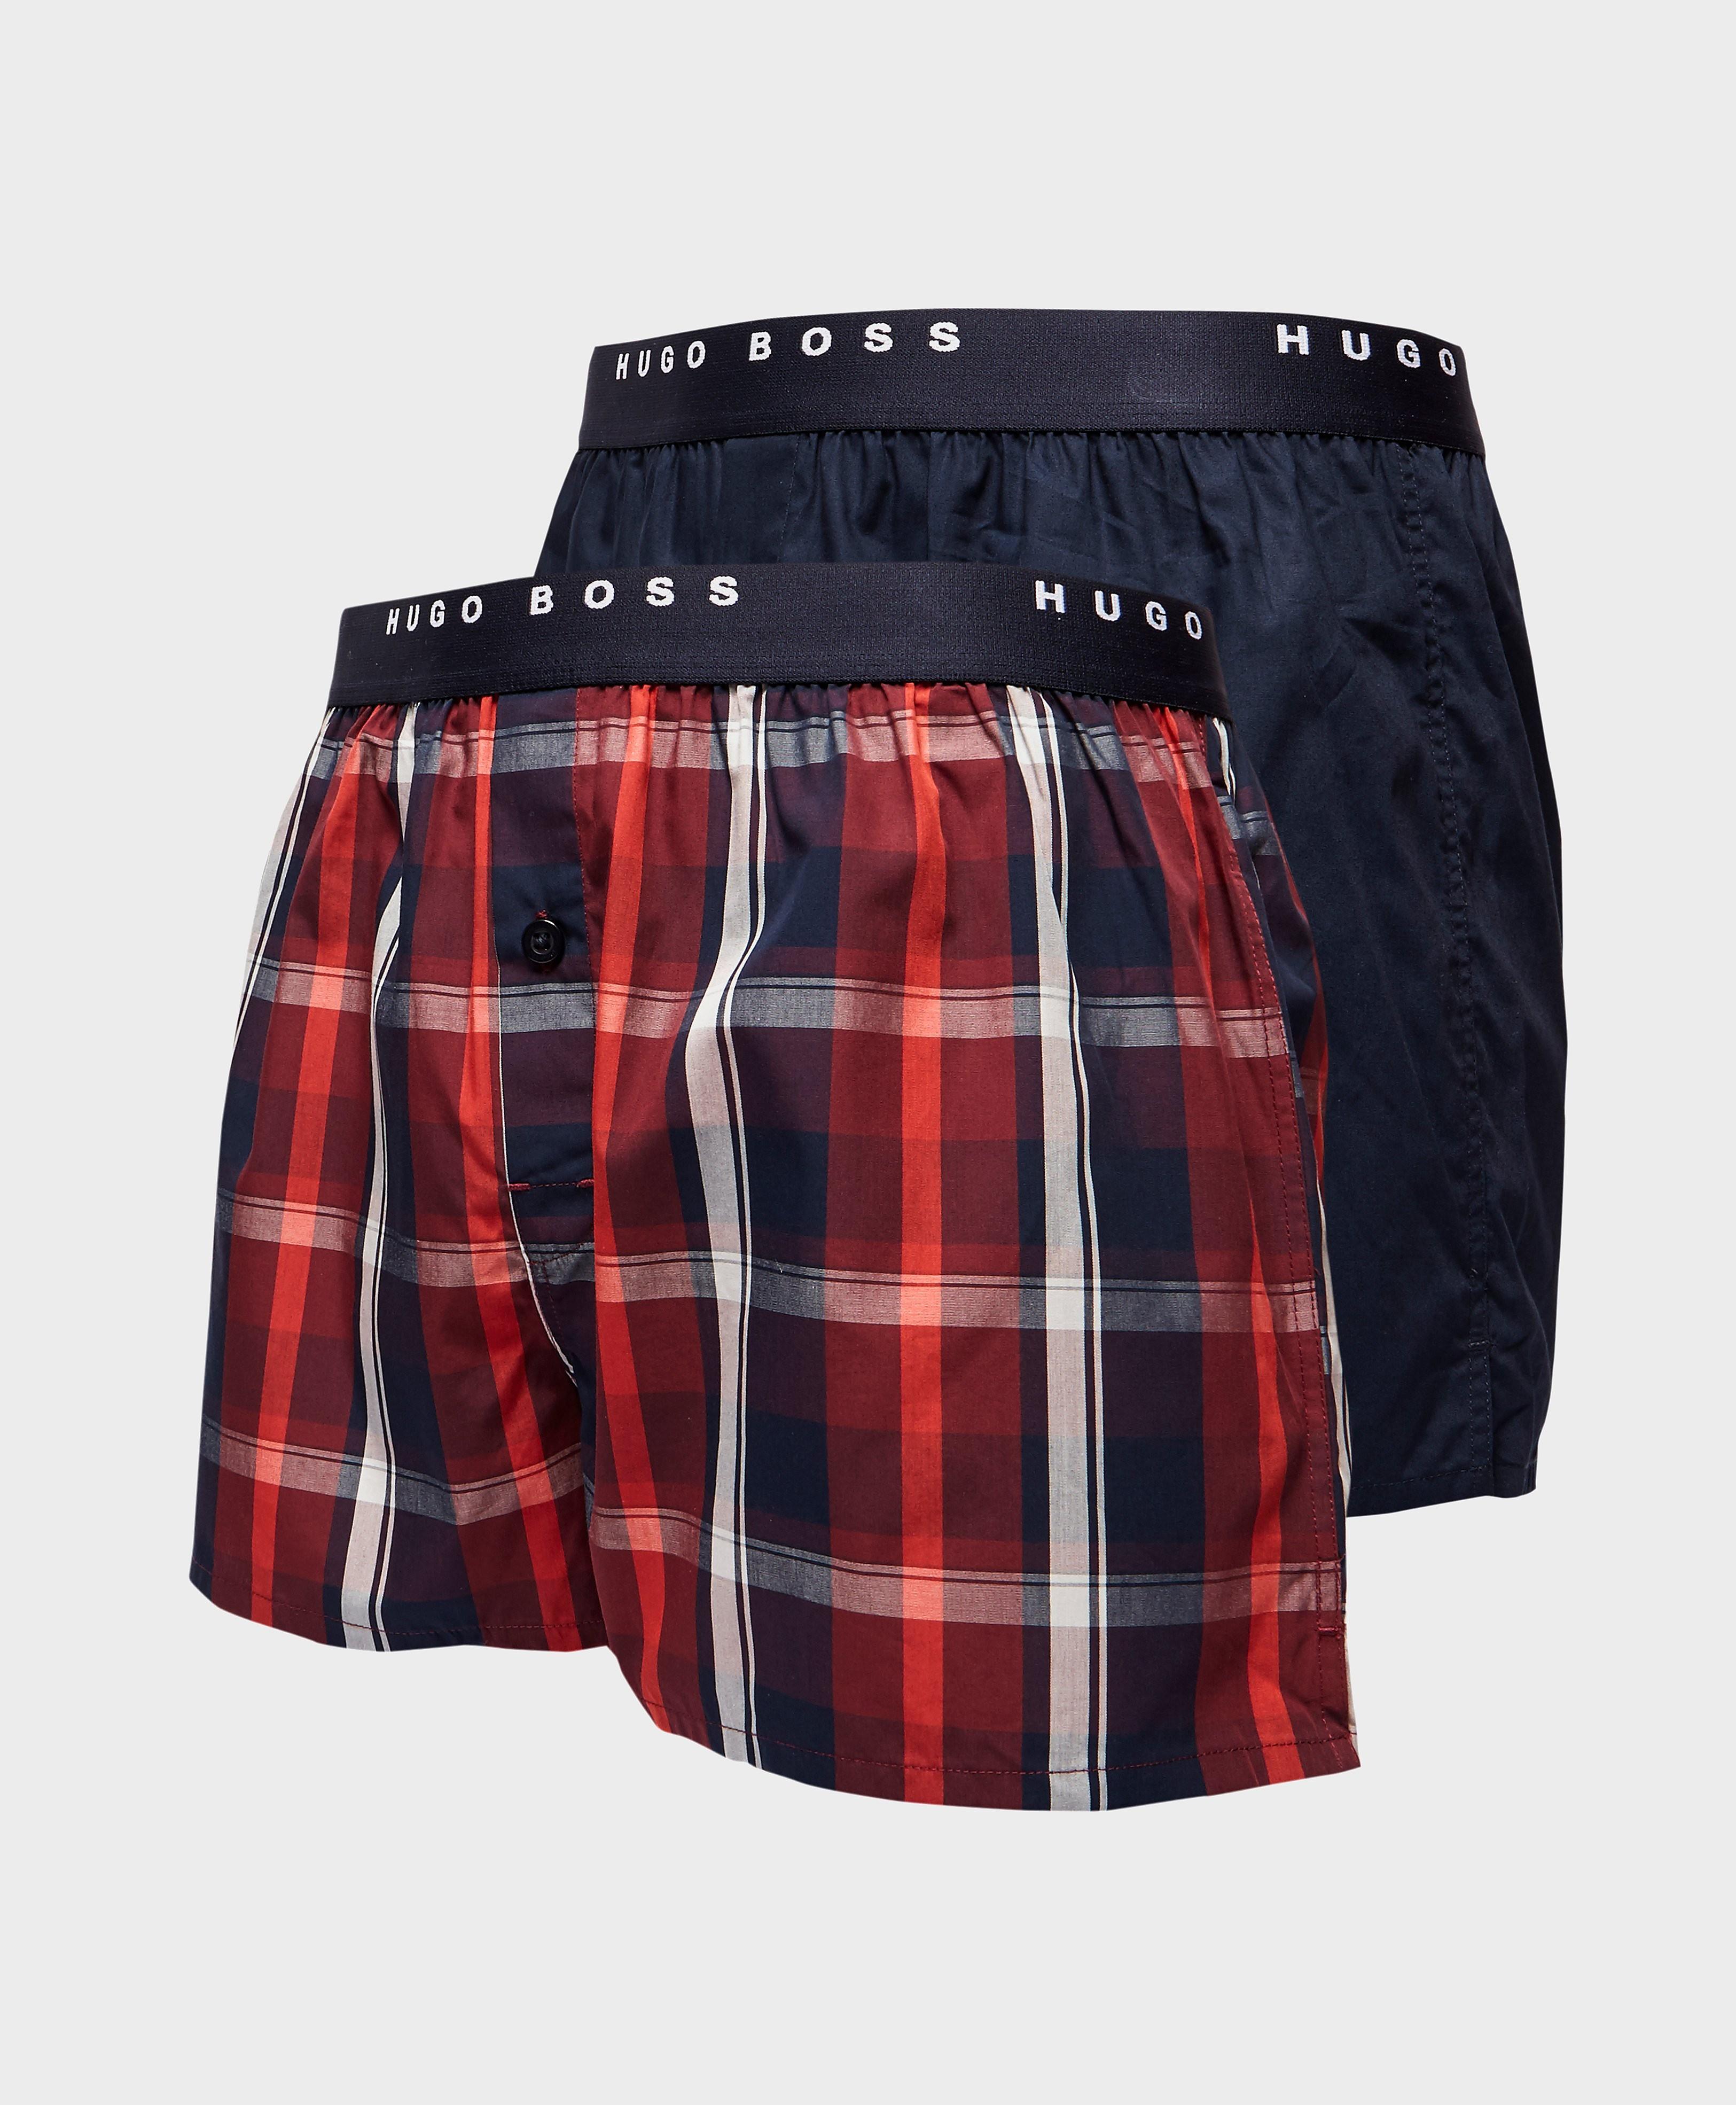 BOSS 2-Pack Woven Check Boxer Shorts